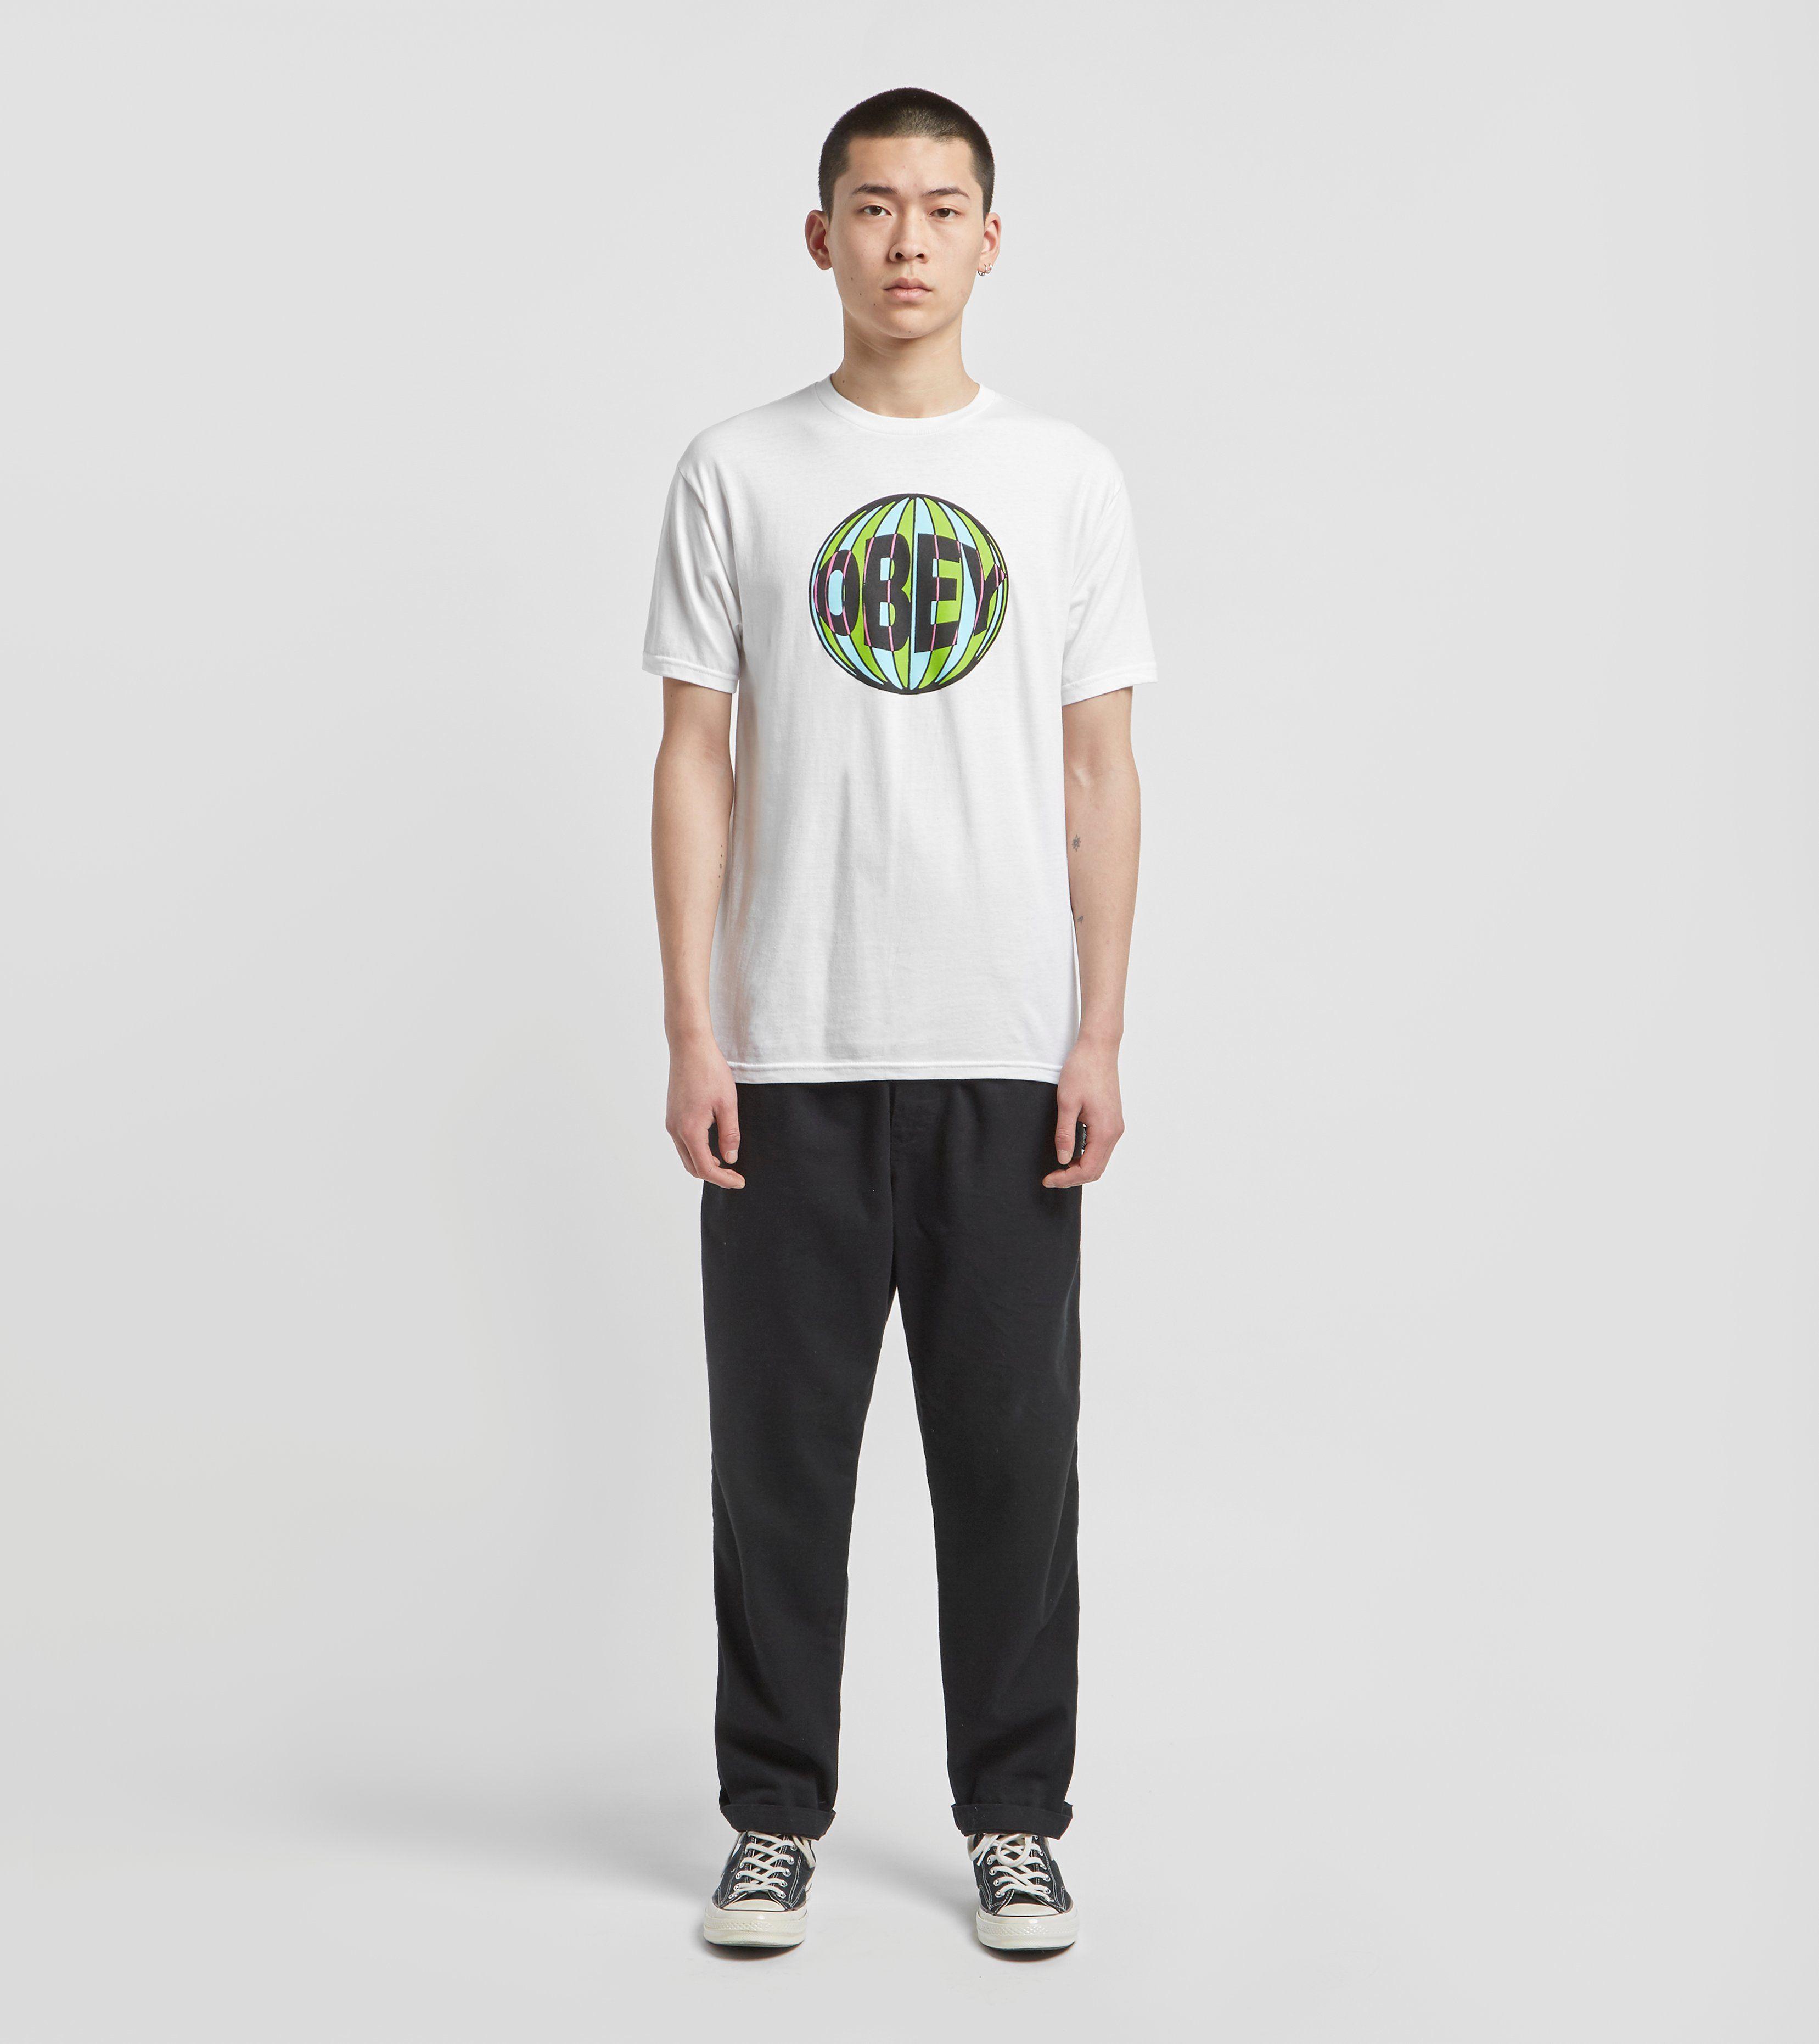 Obey Ball T-Shirt